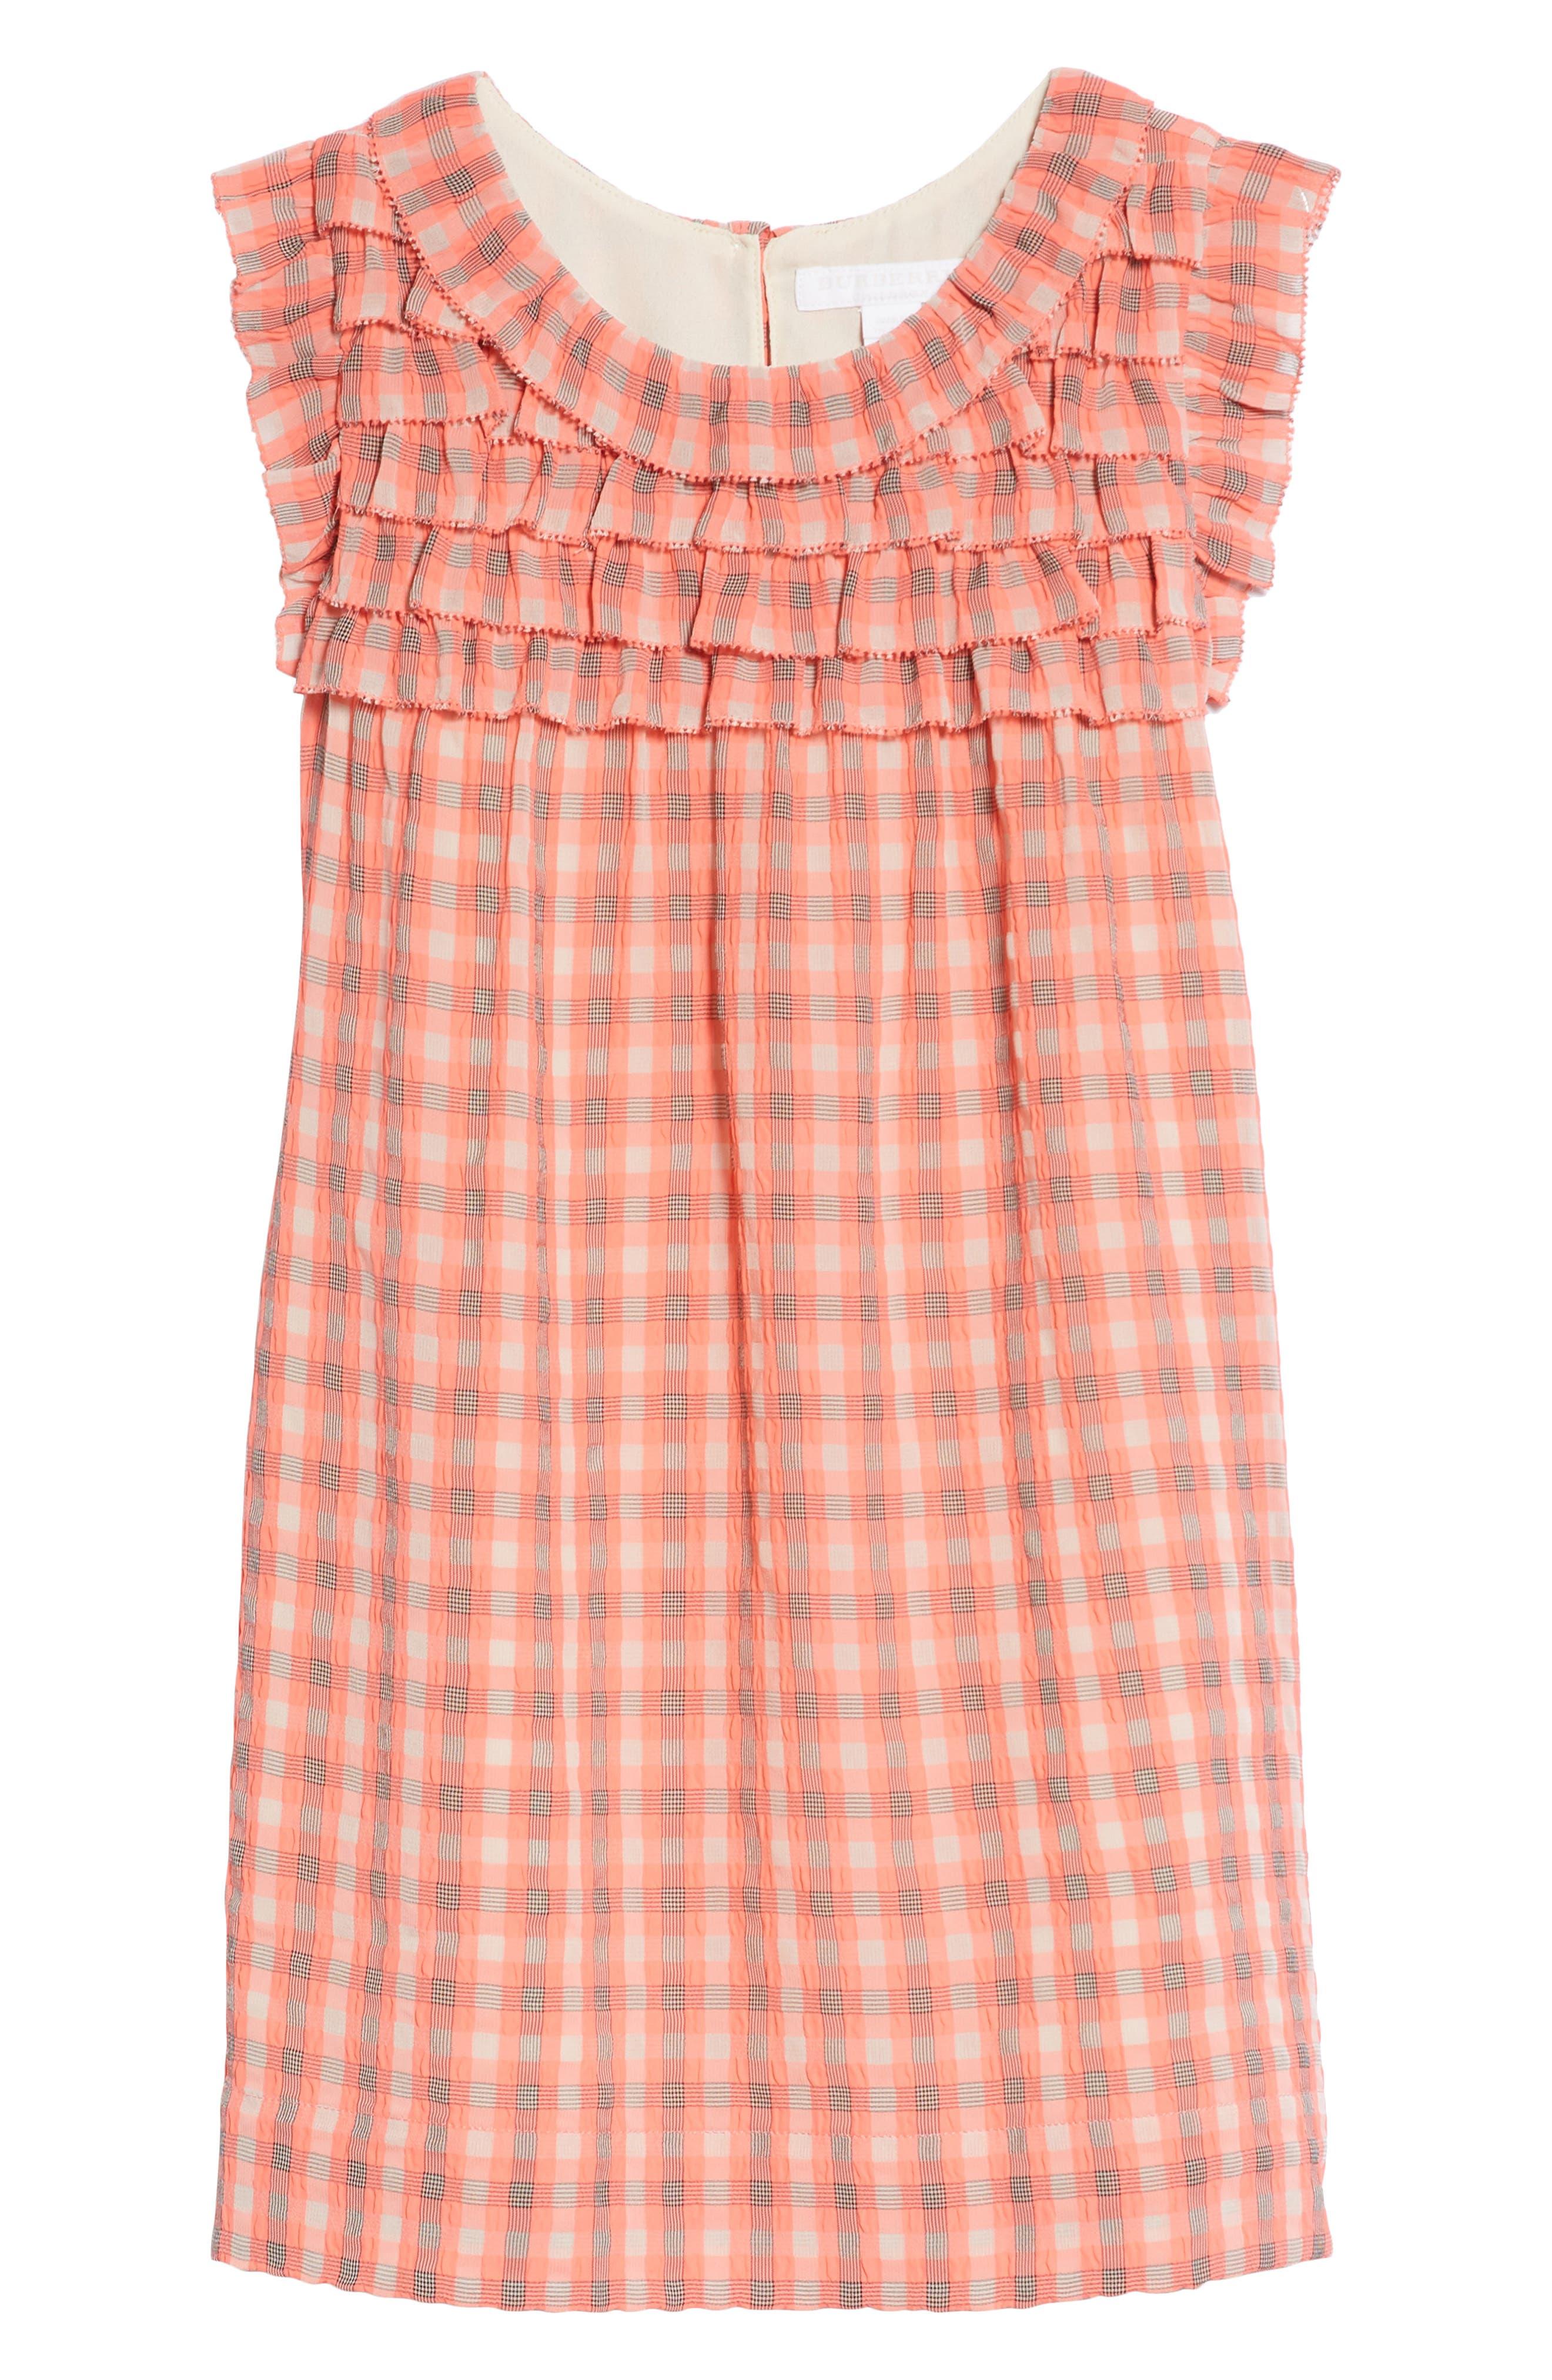 Main Image - Burberry Magnoly Check Ruffle Dress (Little Girls & Big Girls)